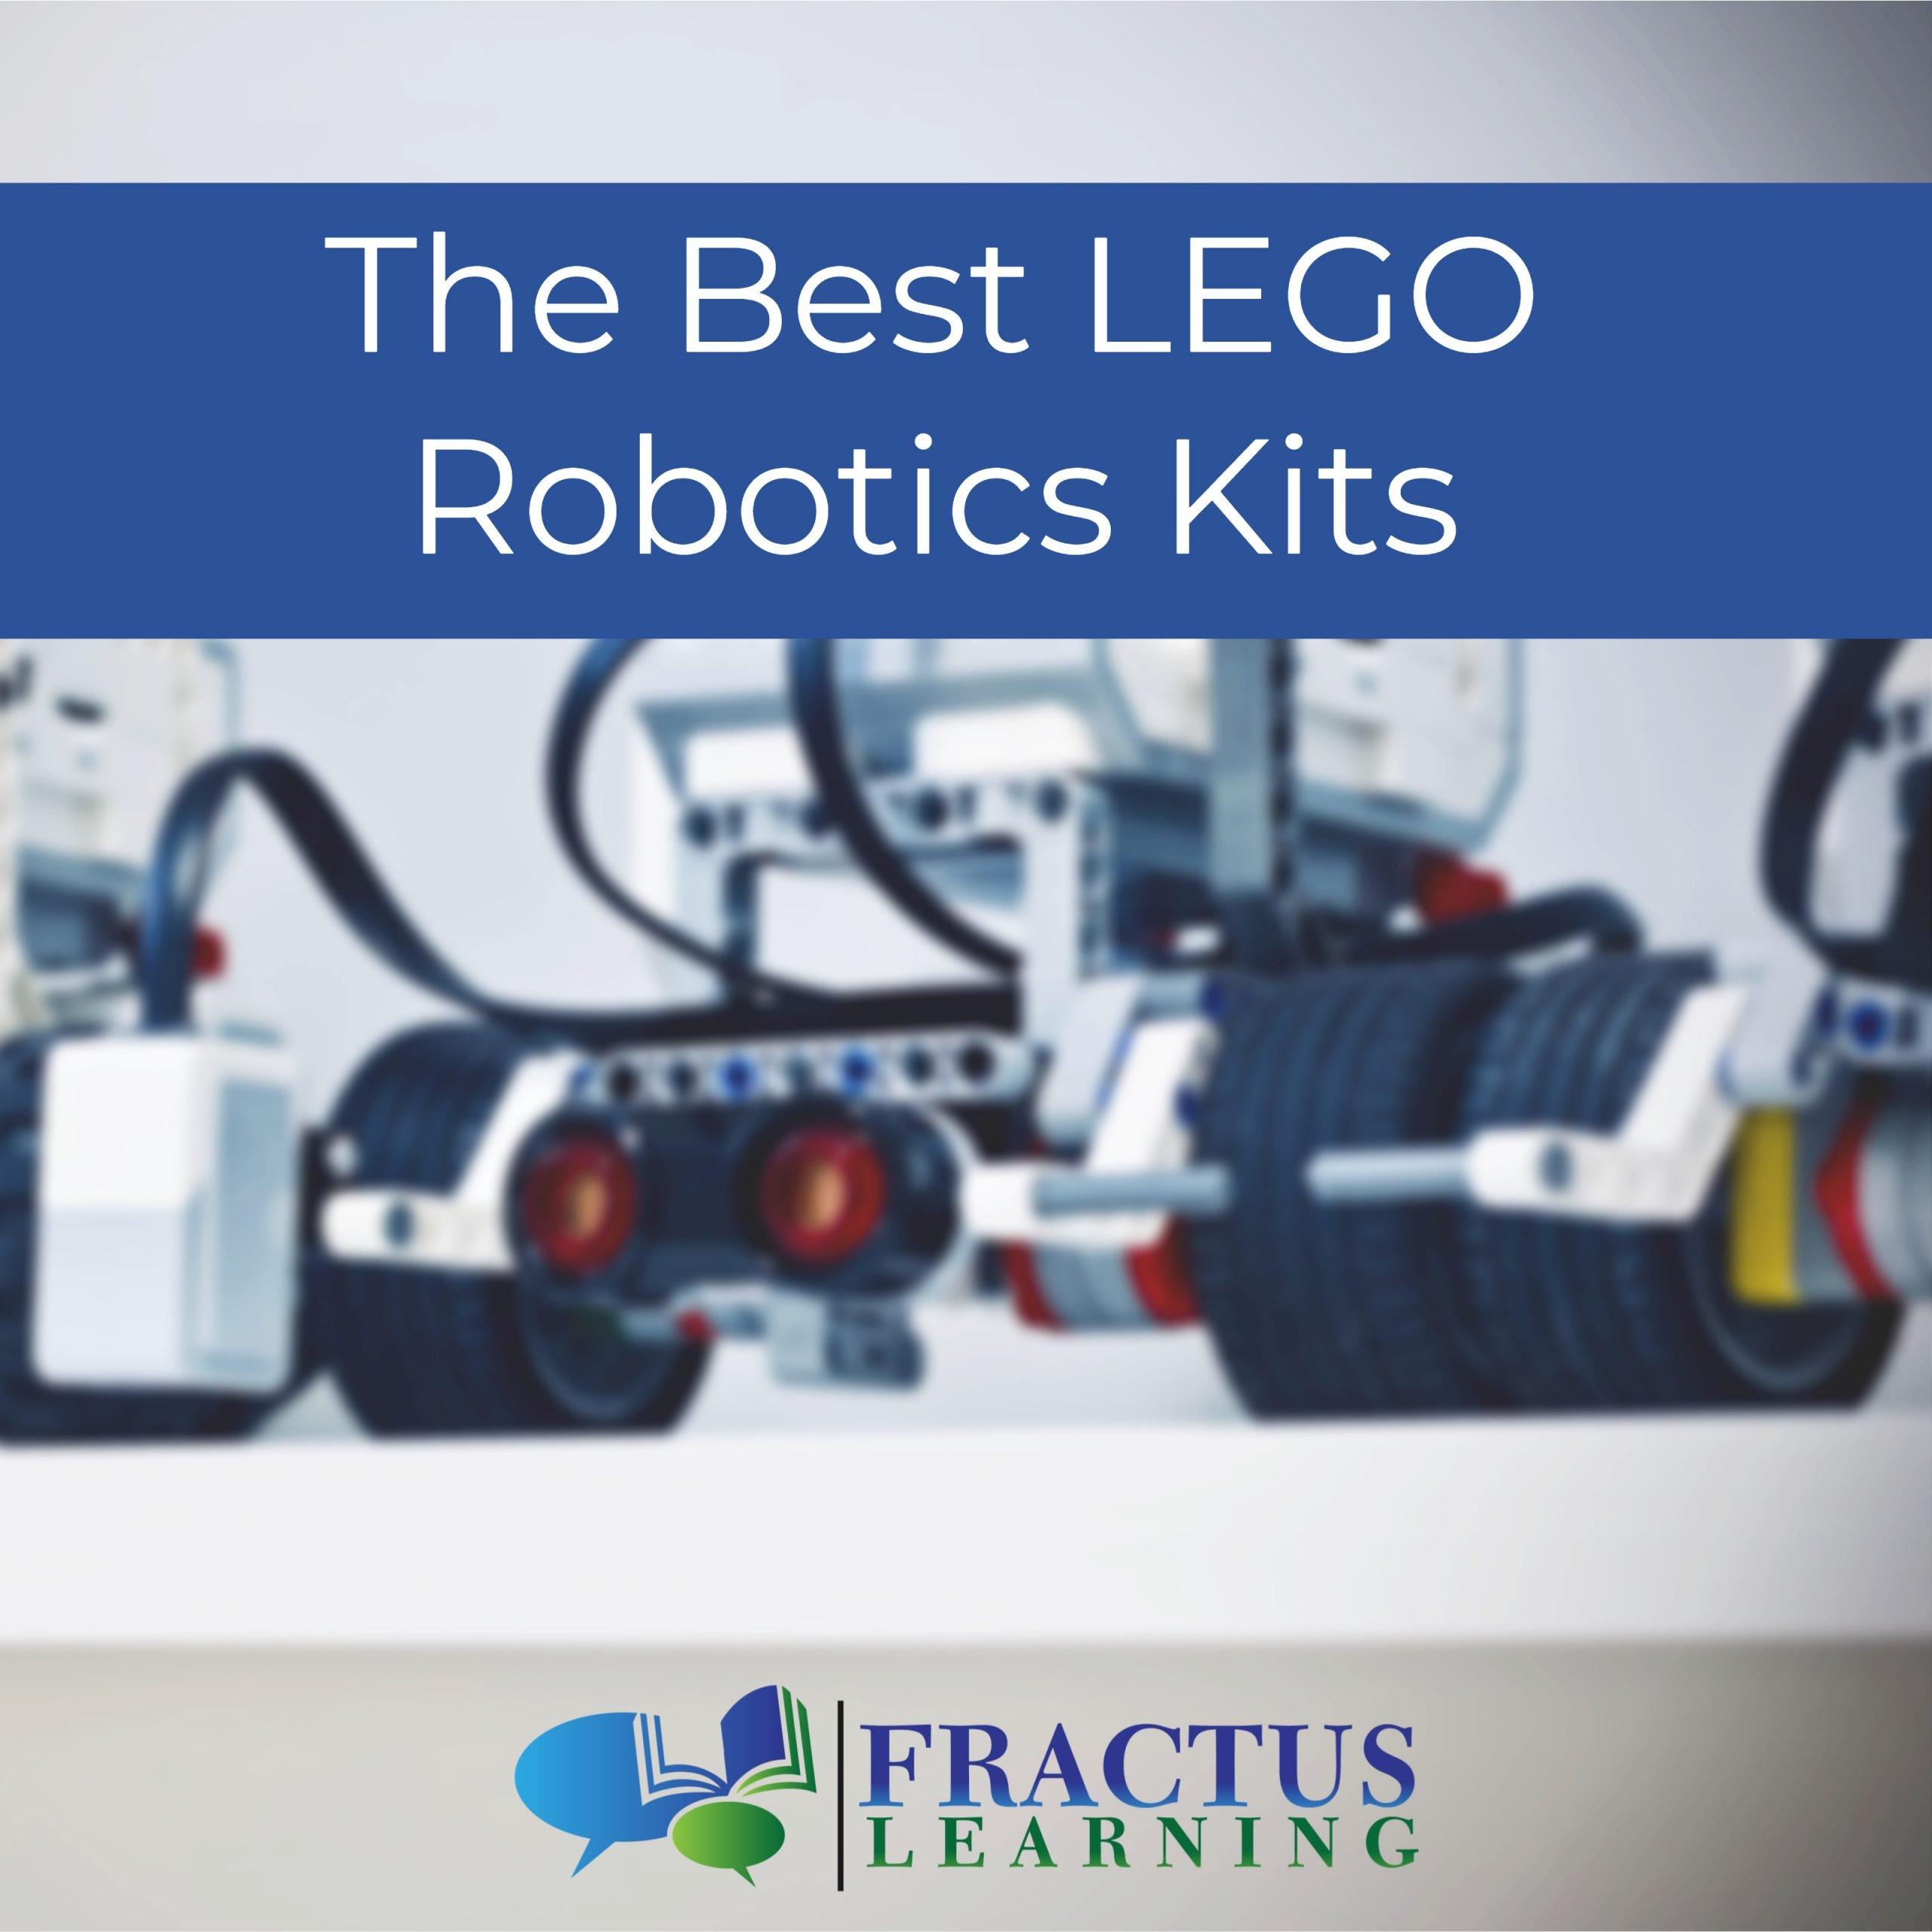 lego robotic kits